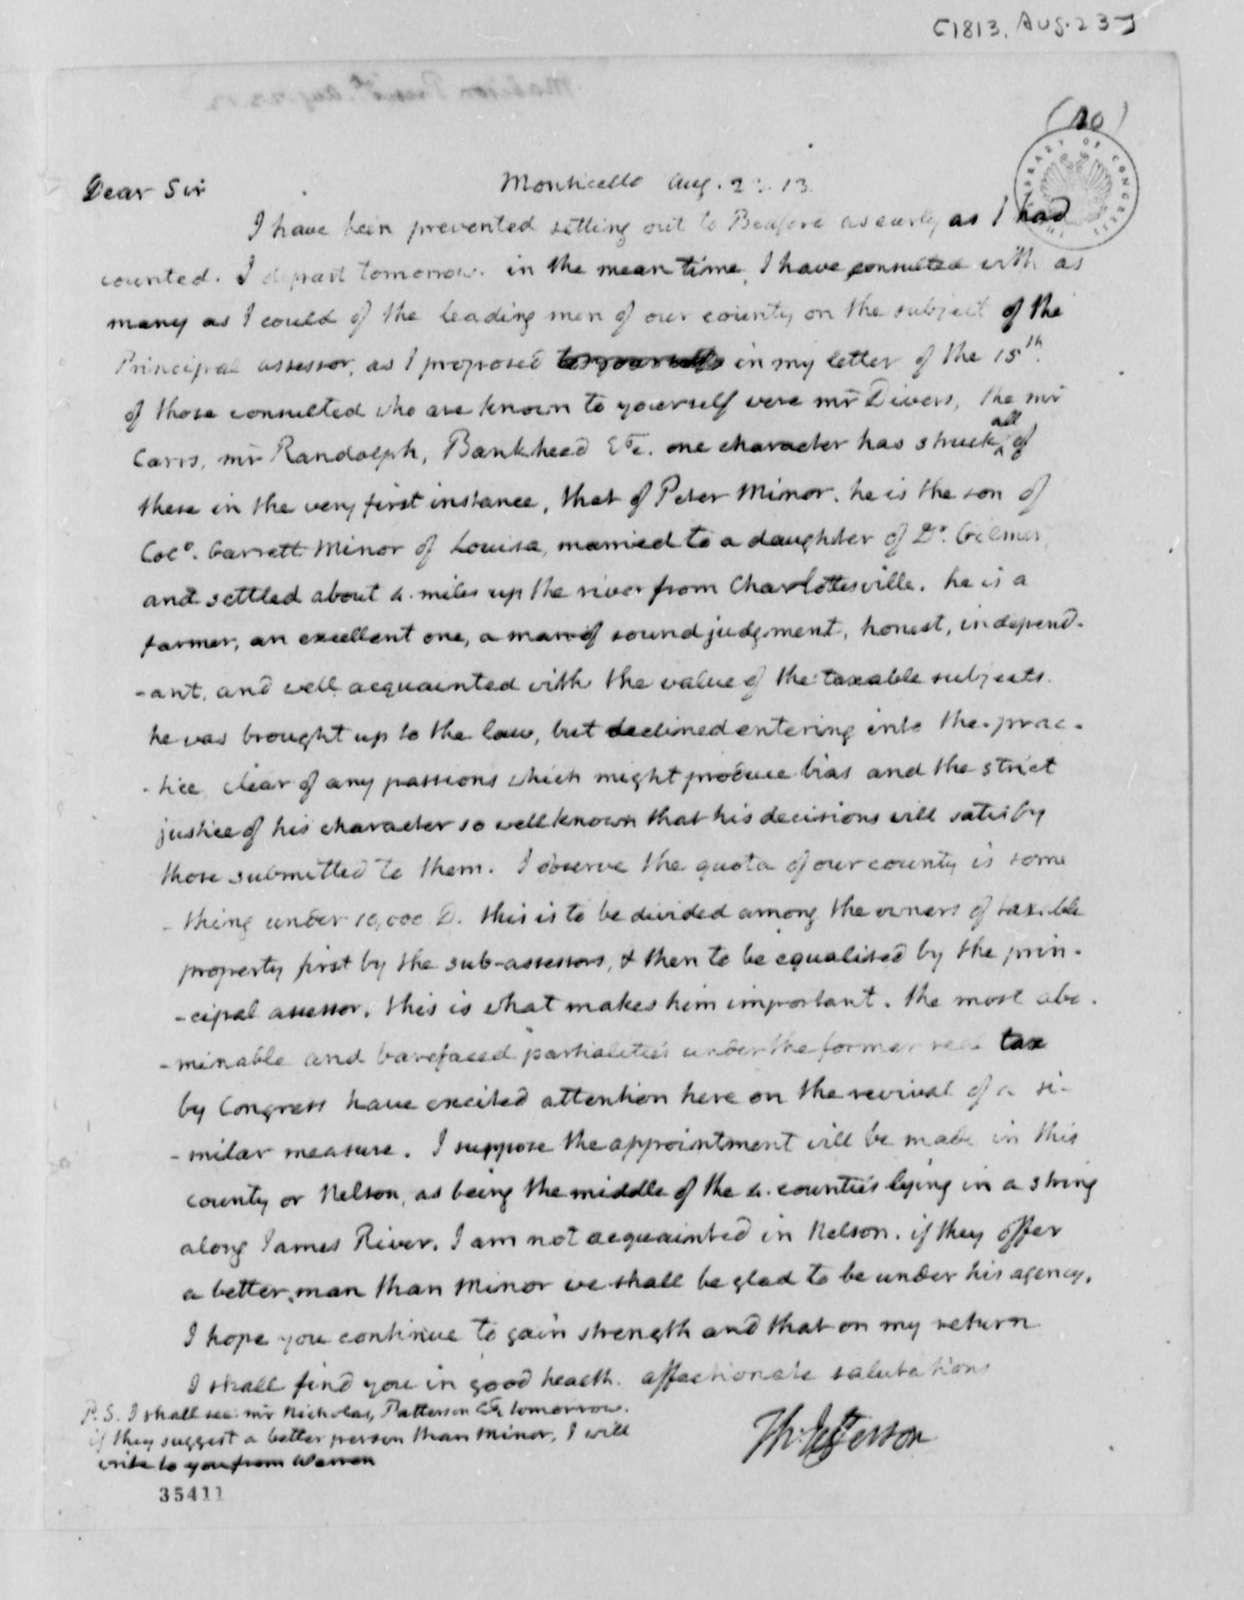 Thomas Jefferson to James Madison, August 23, 1813